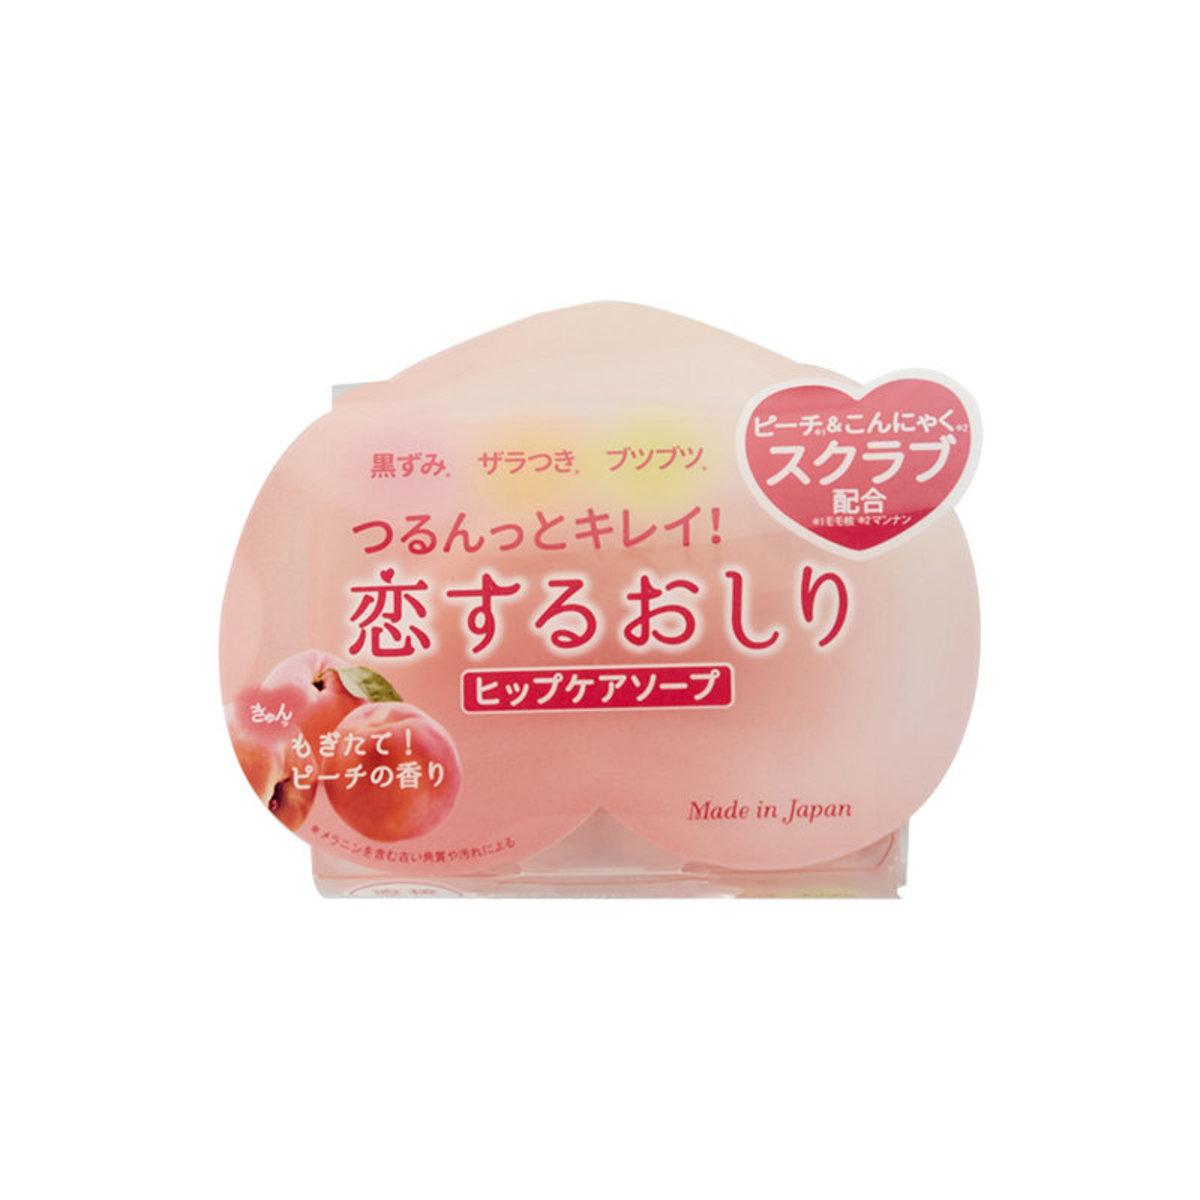 PELICAN - BUTTOCKS HIPS CARE SOAP 80G (4976631478272)